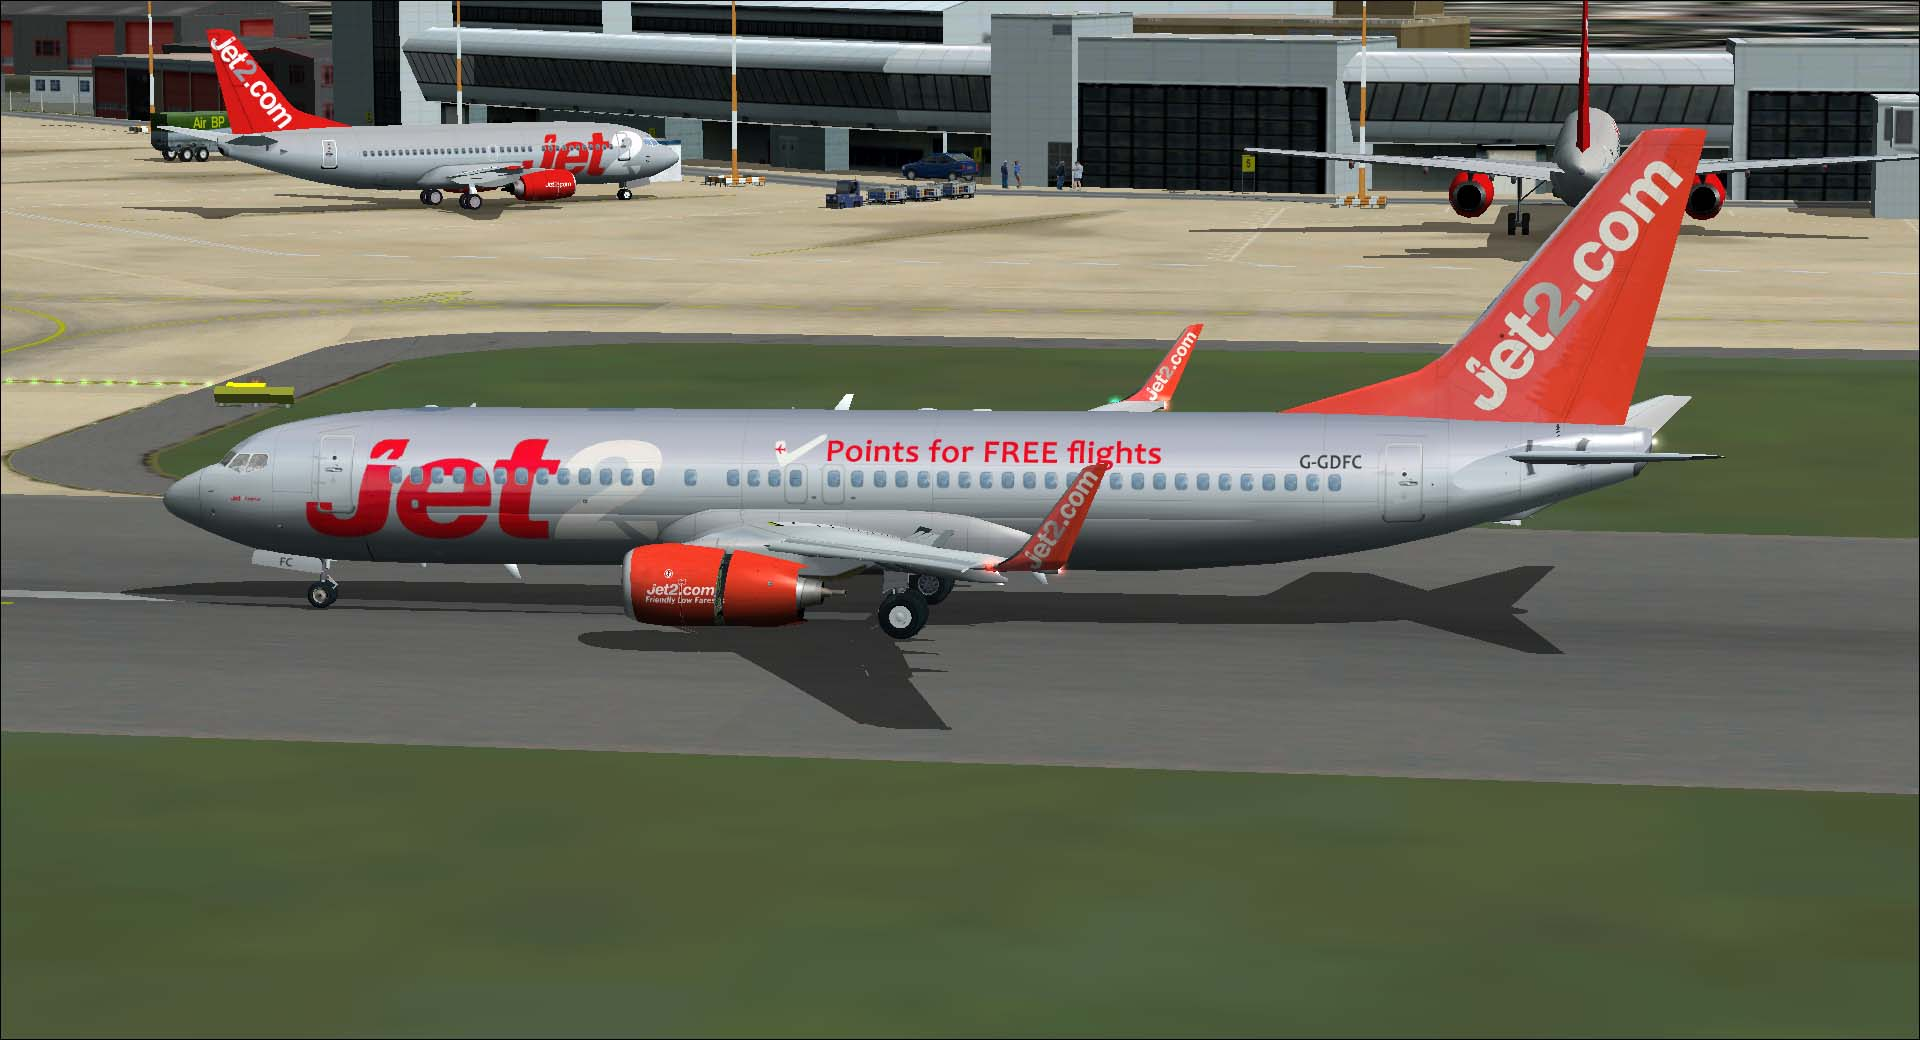 download fmc 737-800 fsx